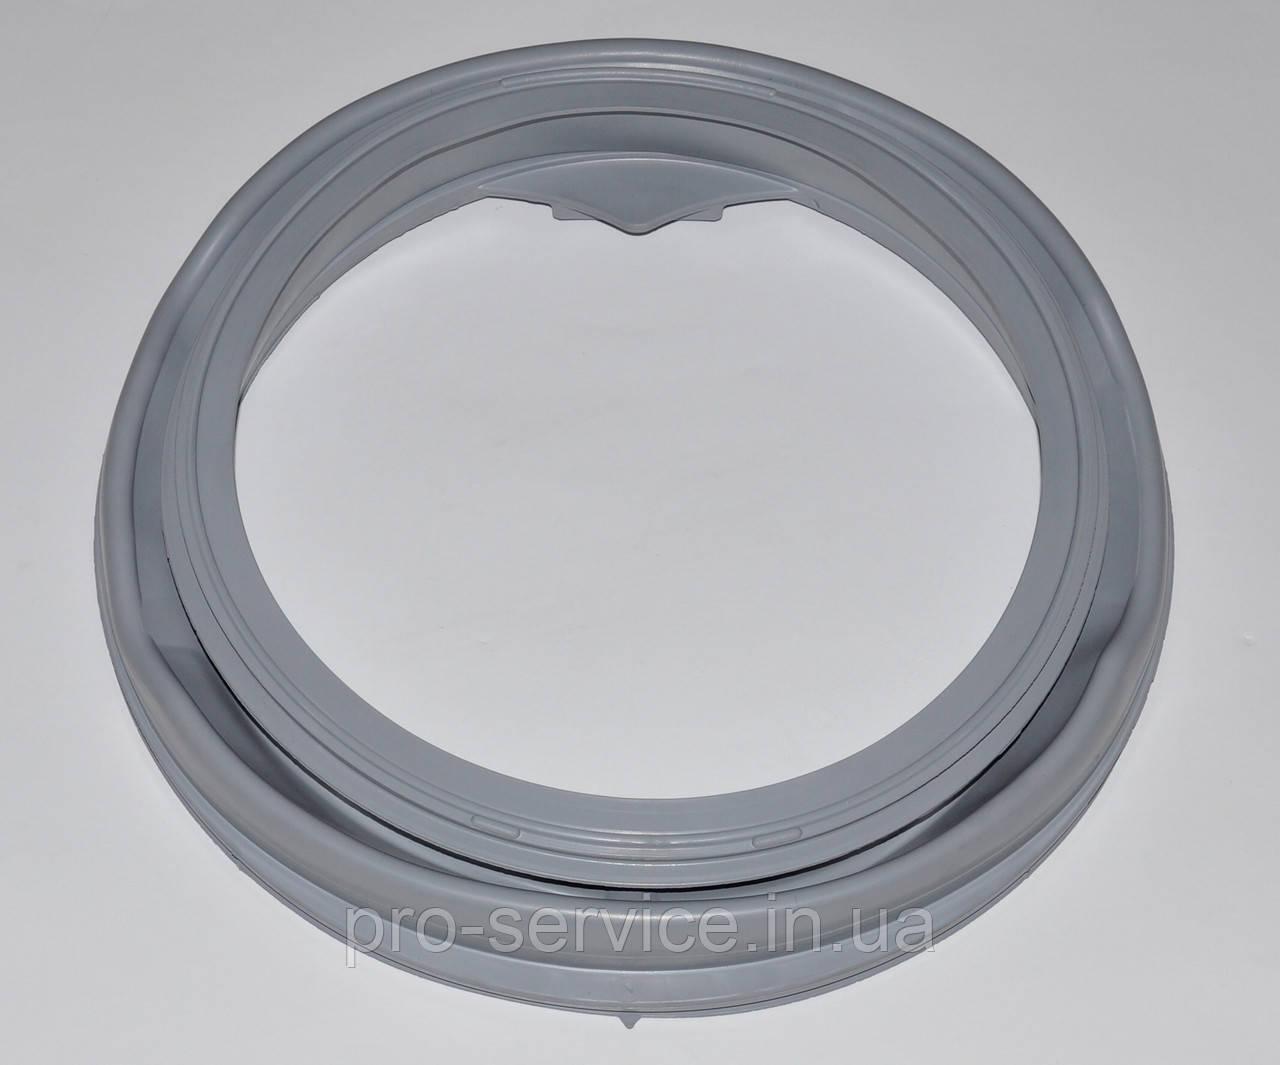 Манжета люка 480111100188 для пральних машин Whirlpool